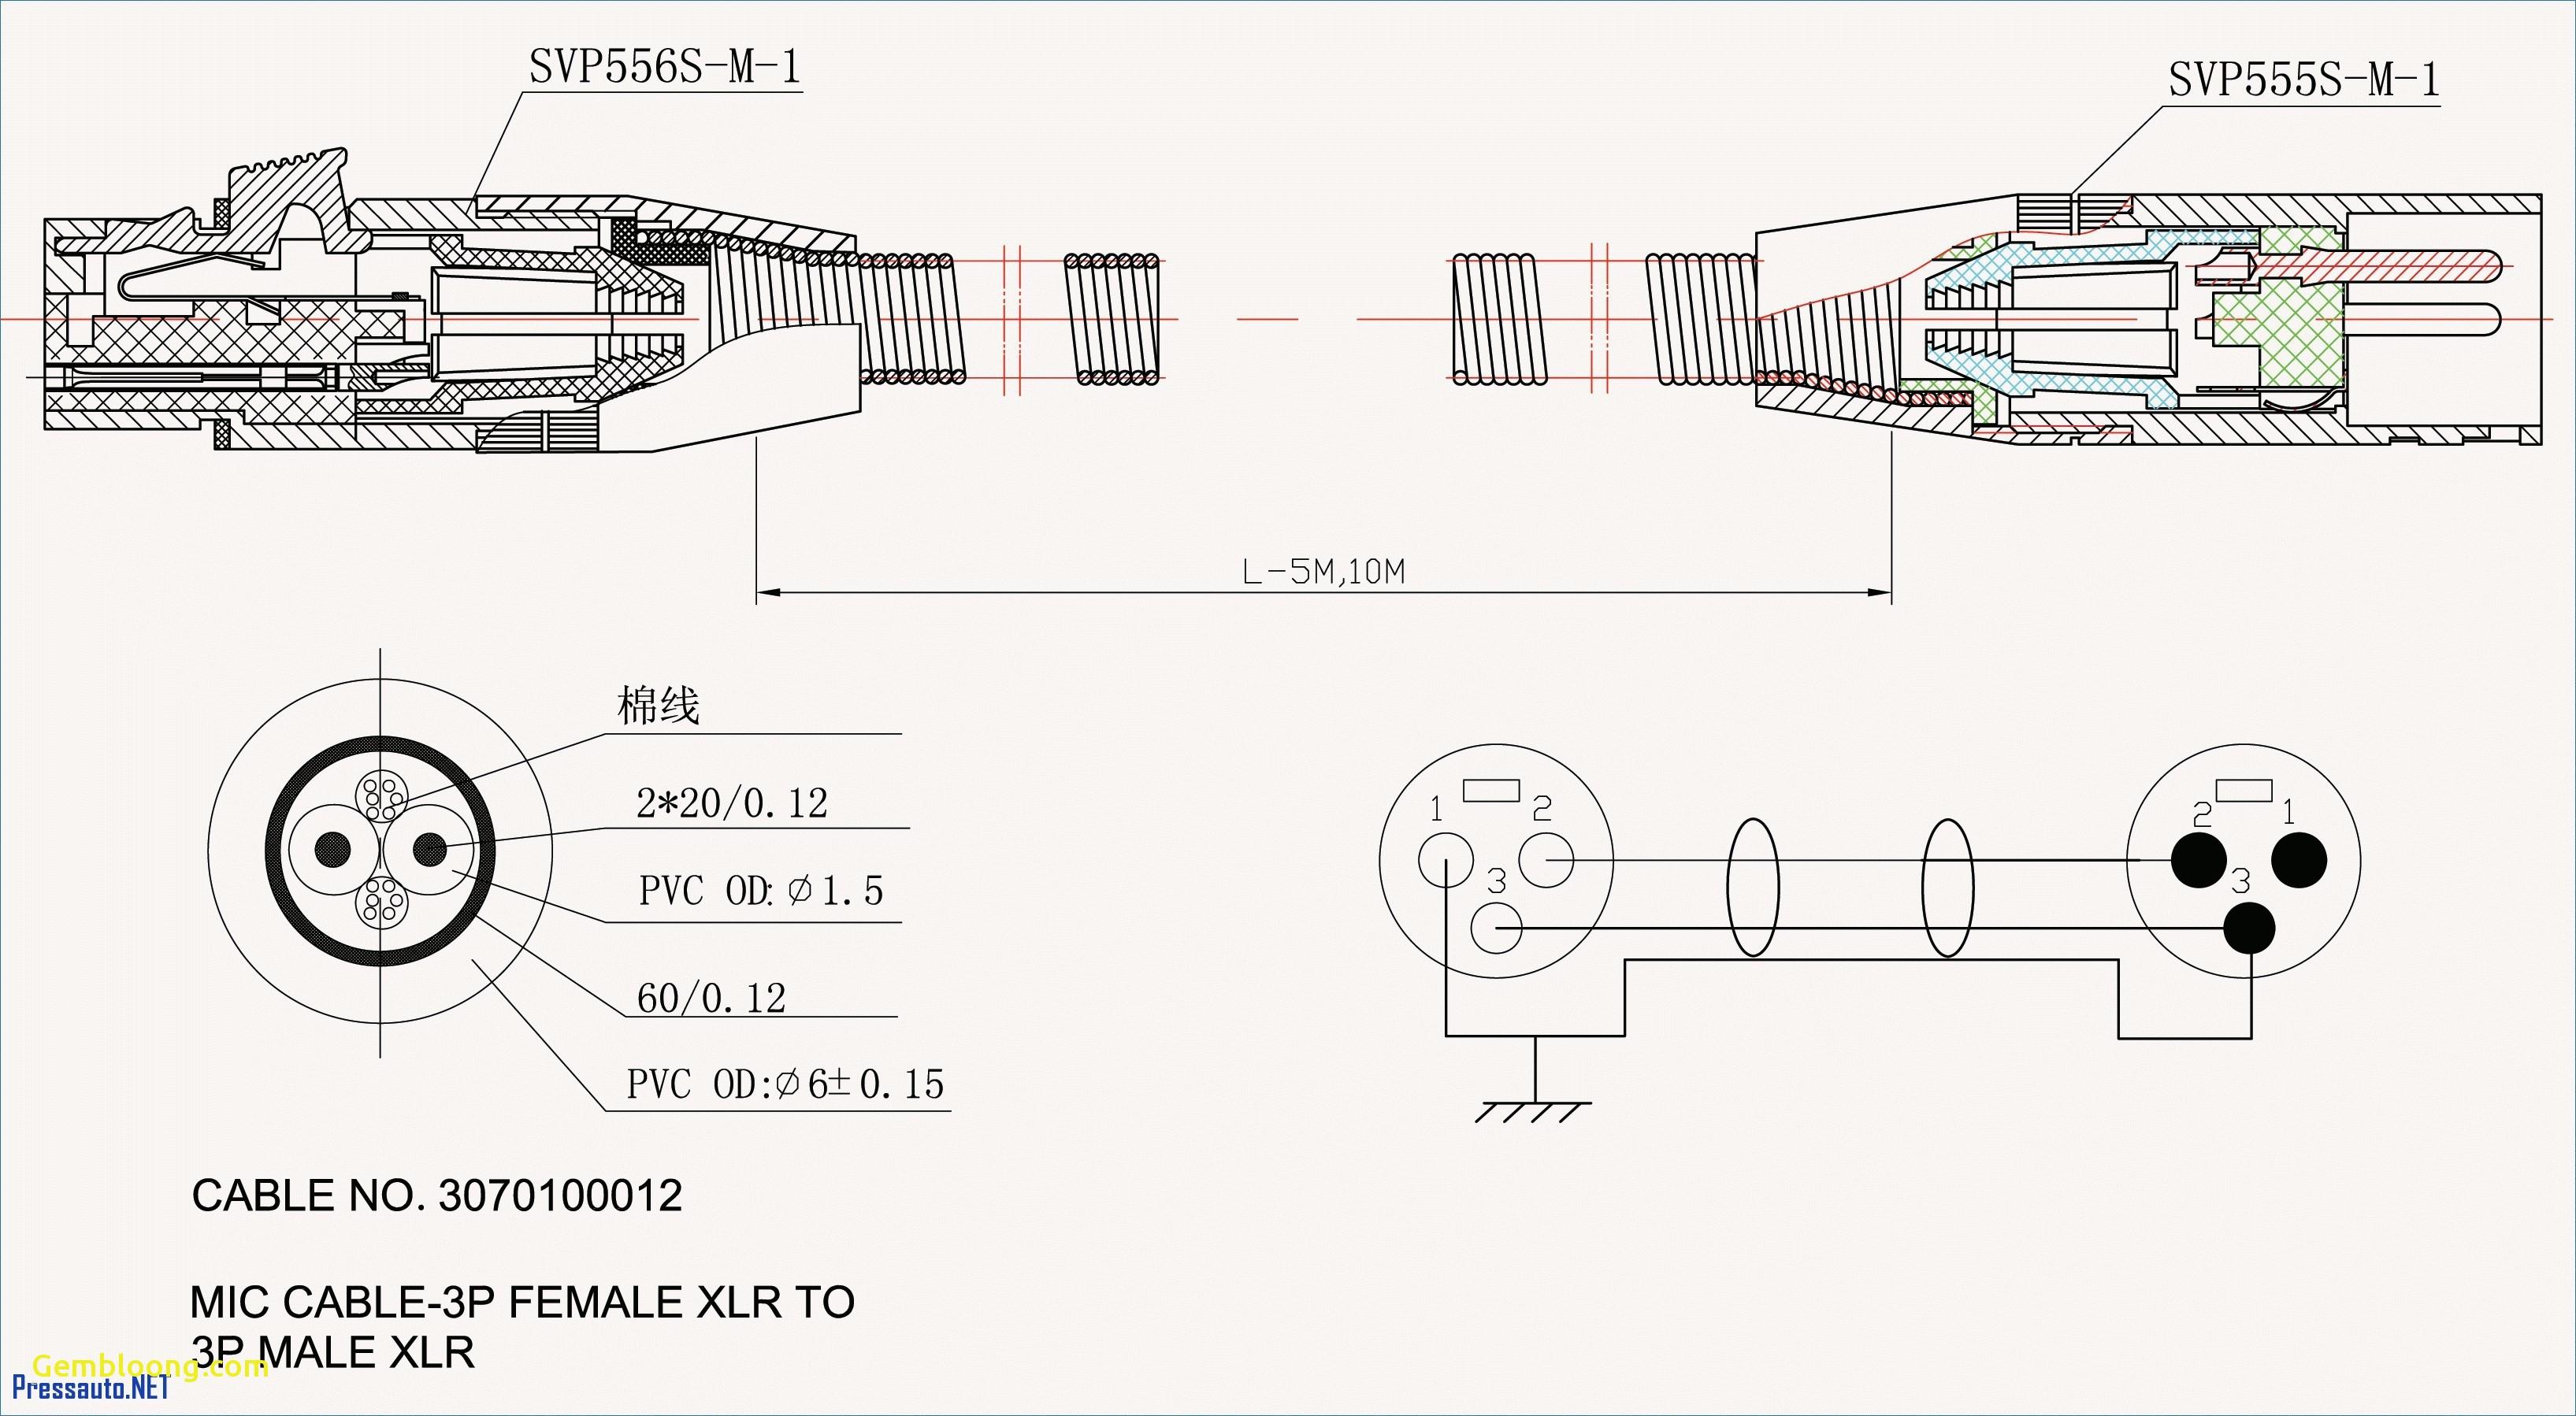 Air Cooled Engine Diagram ford Aerostar Engine Diagram 2000 ford Ranger 3 0 Heater Hose Of Air Cooled Engine Diagram